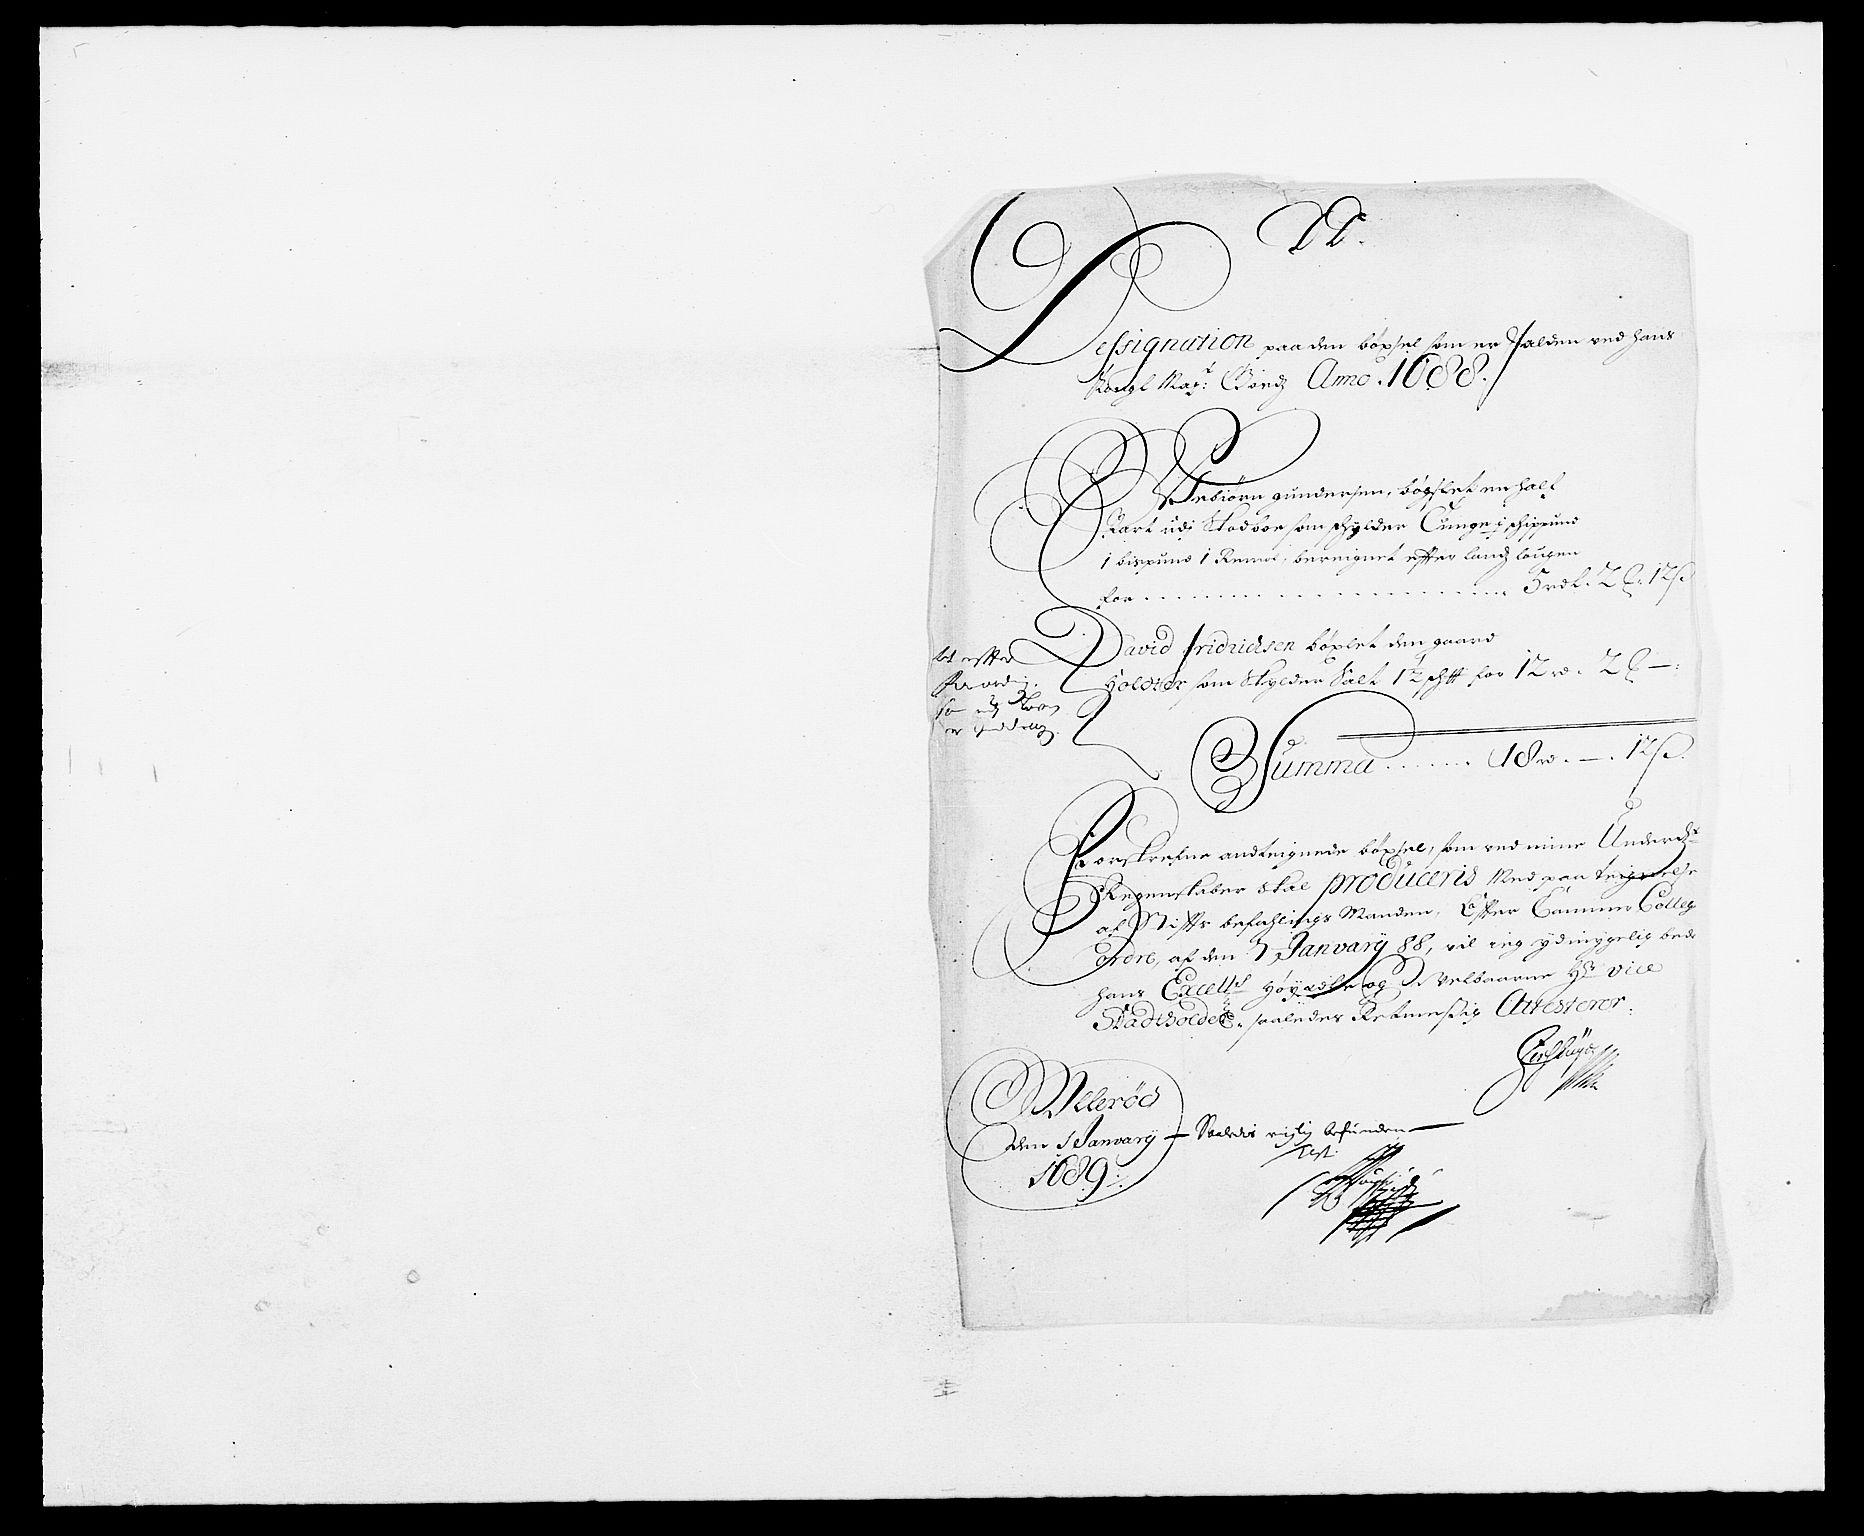 RA, Rentekammeret inntil 1814, Reviderte regnskaper, Fogderegnskap, R09/L0434: Fogderegnskap Follo, 1687-1688, s. 214